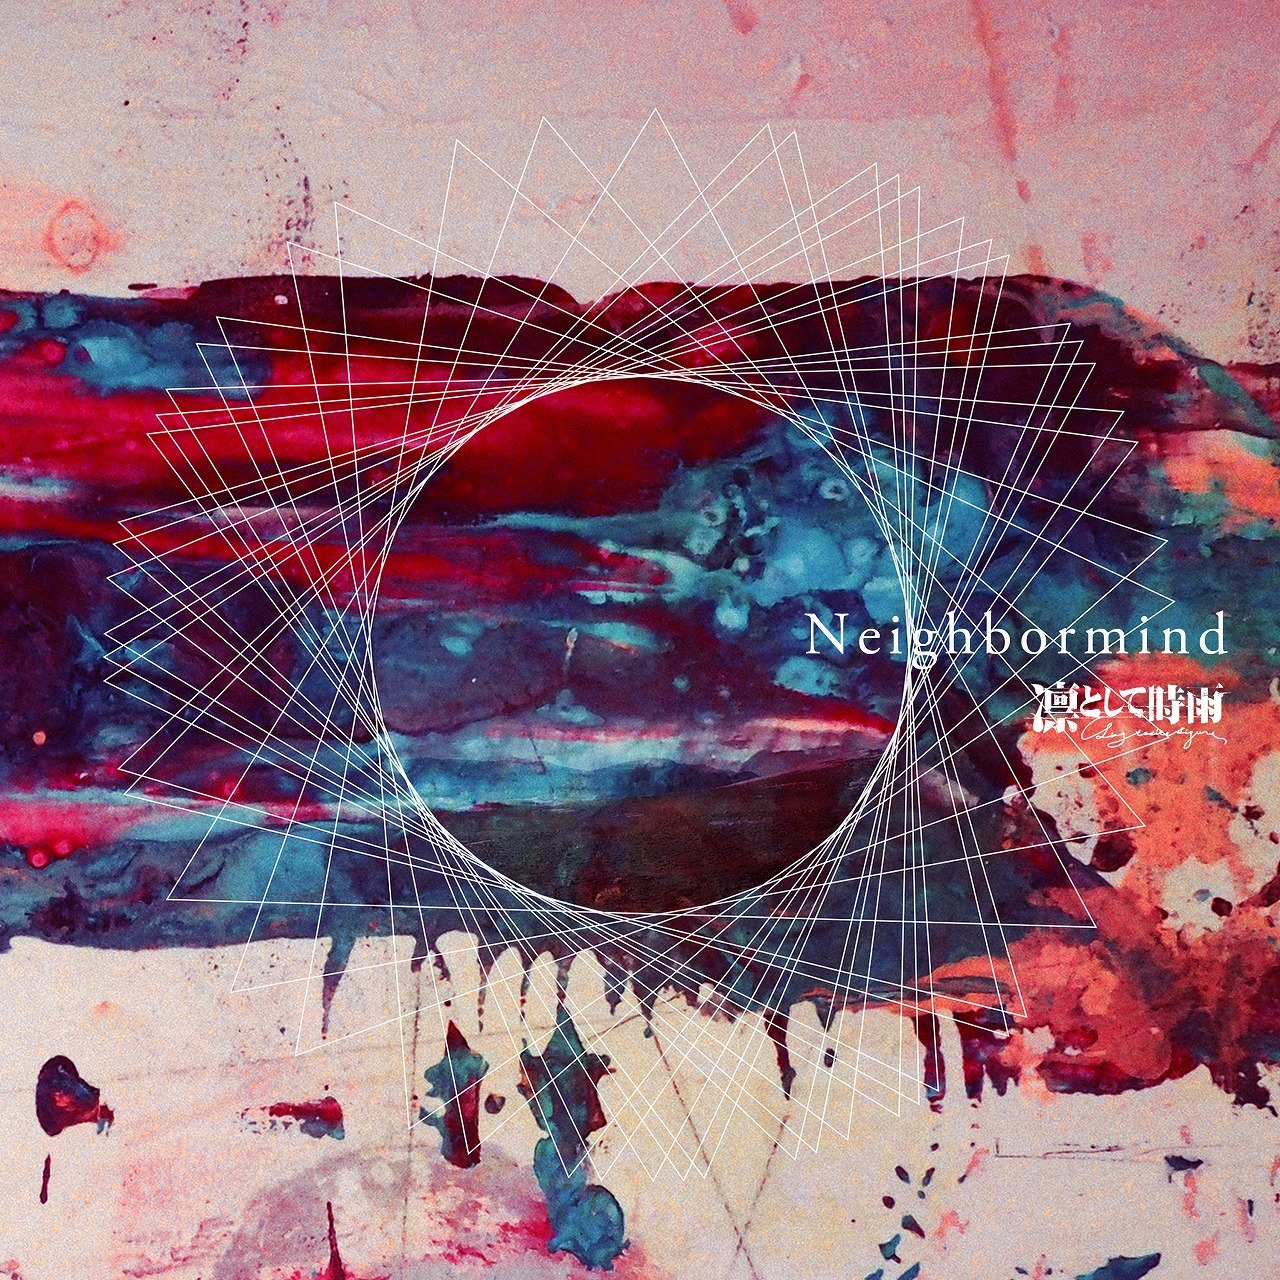 「Neighbormind」配信サムネイル